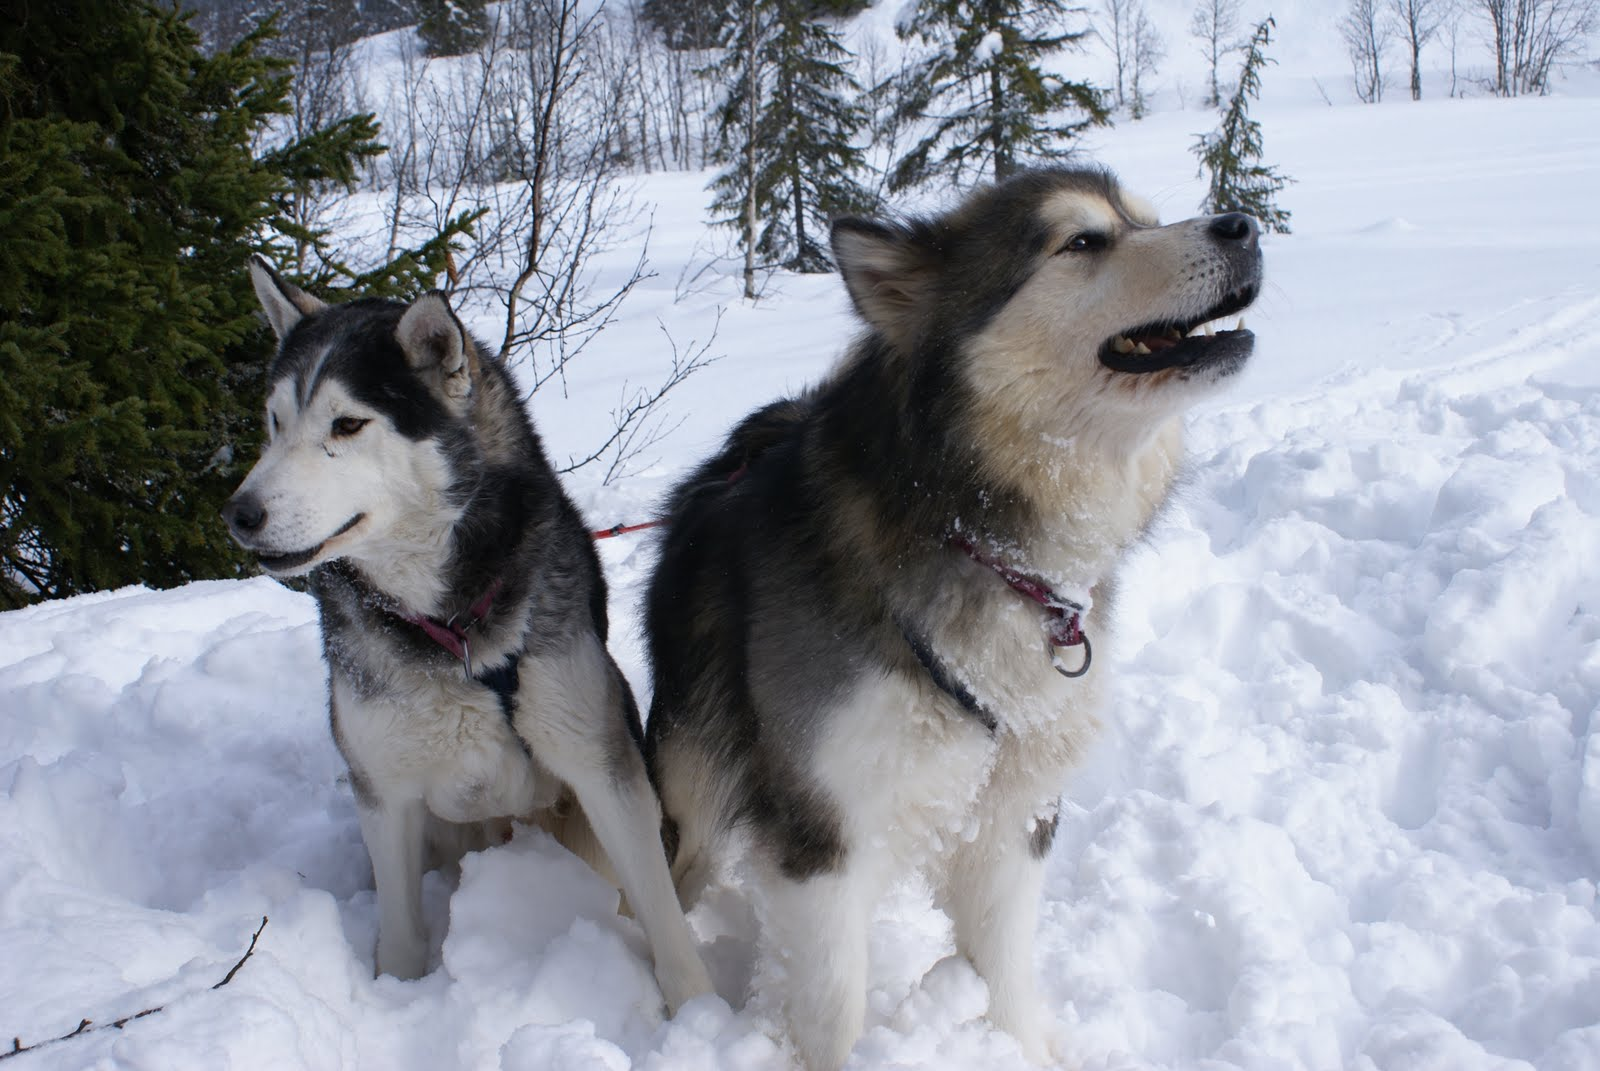 http://2.bp.blogspot.com/-iXKqvcPFVjI/Th7yECM58rI/AAAAAAAAABE/OJYlnw61Xdg/s1600/Alaskan+Malamute+Dogs+Wallpapers++5.jpg